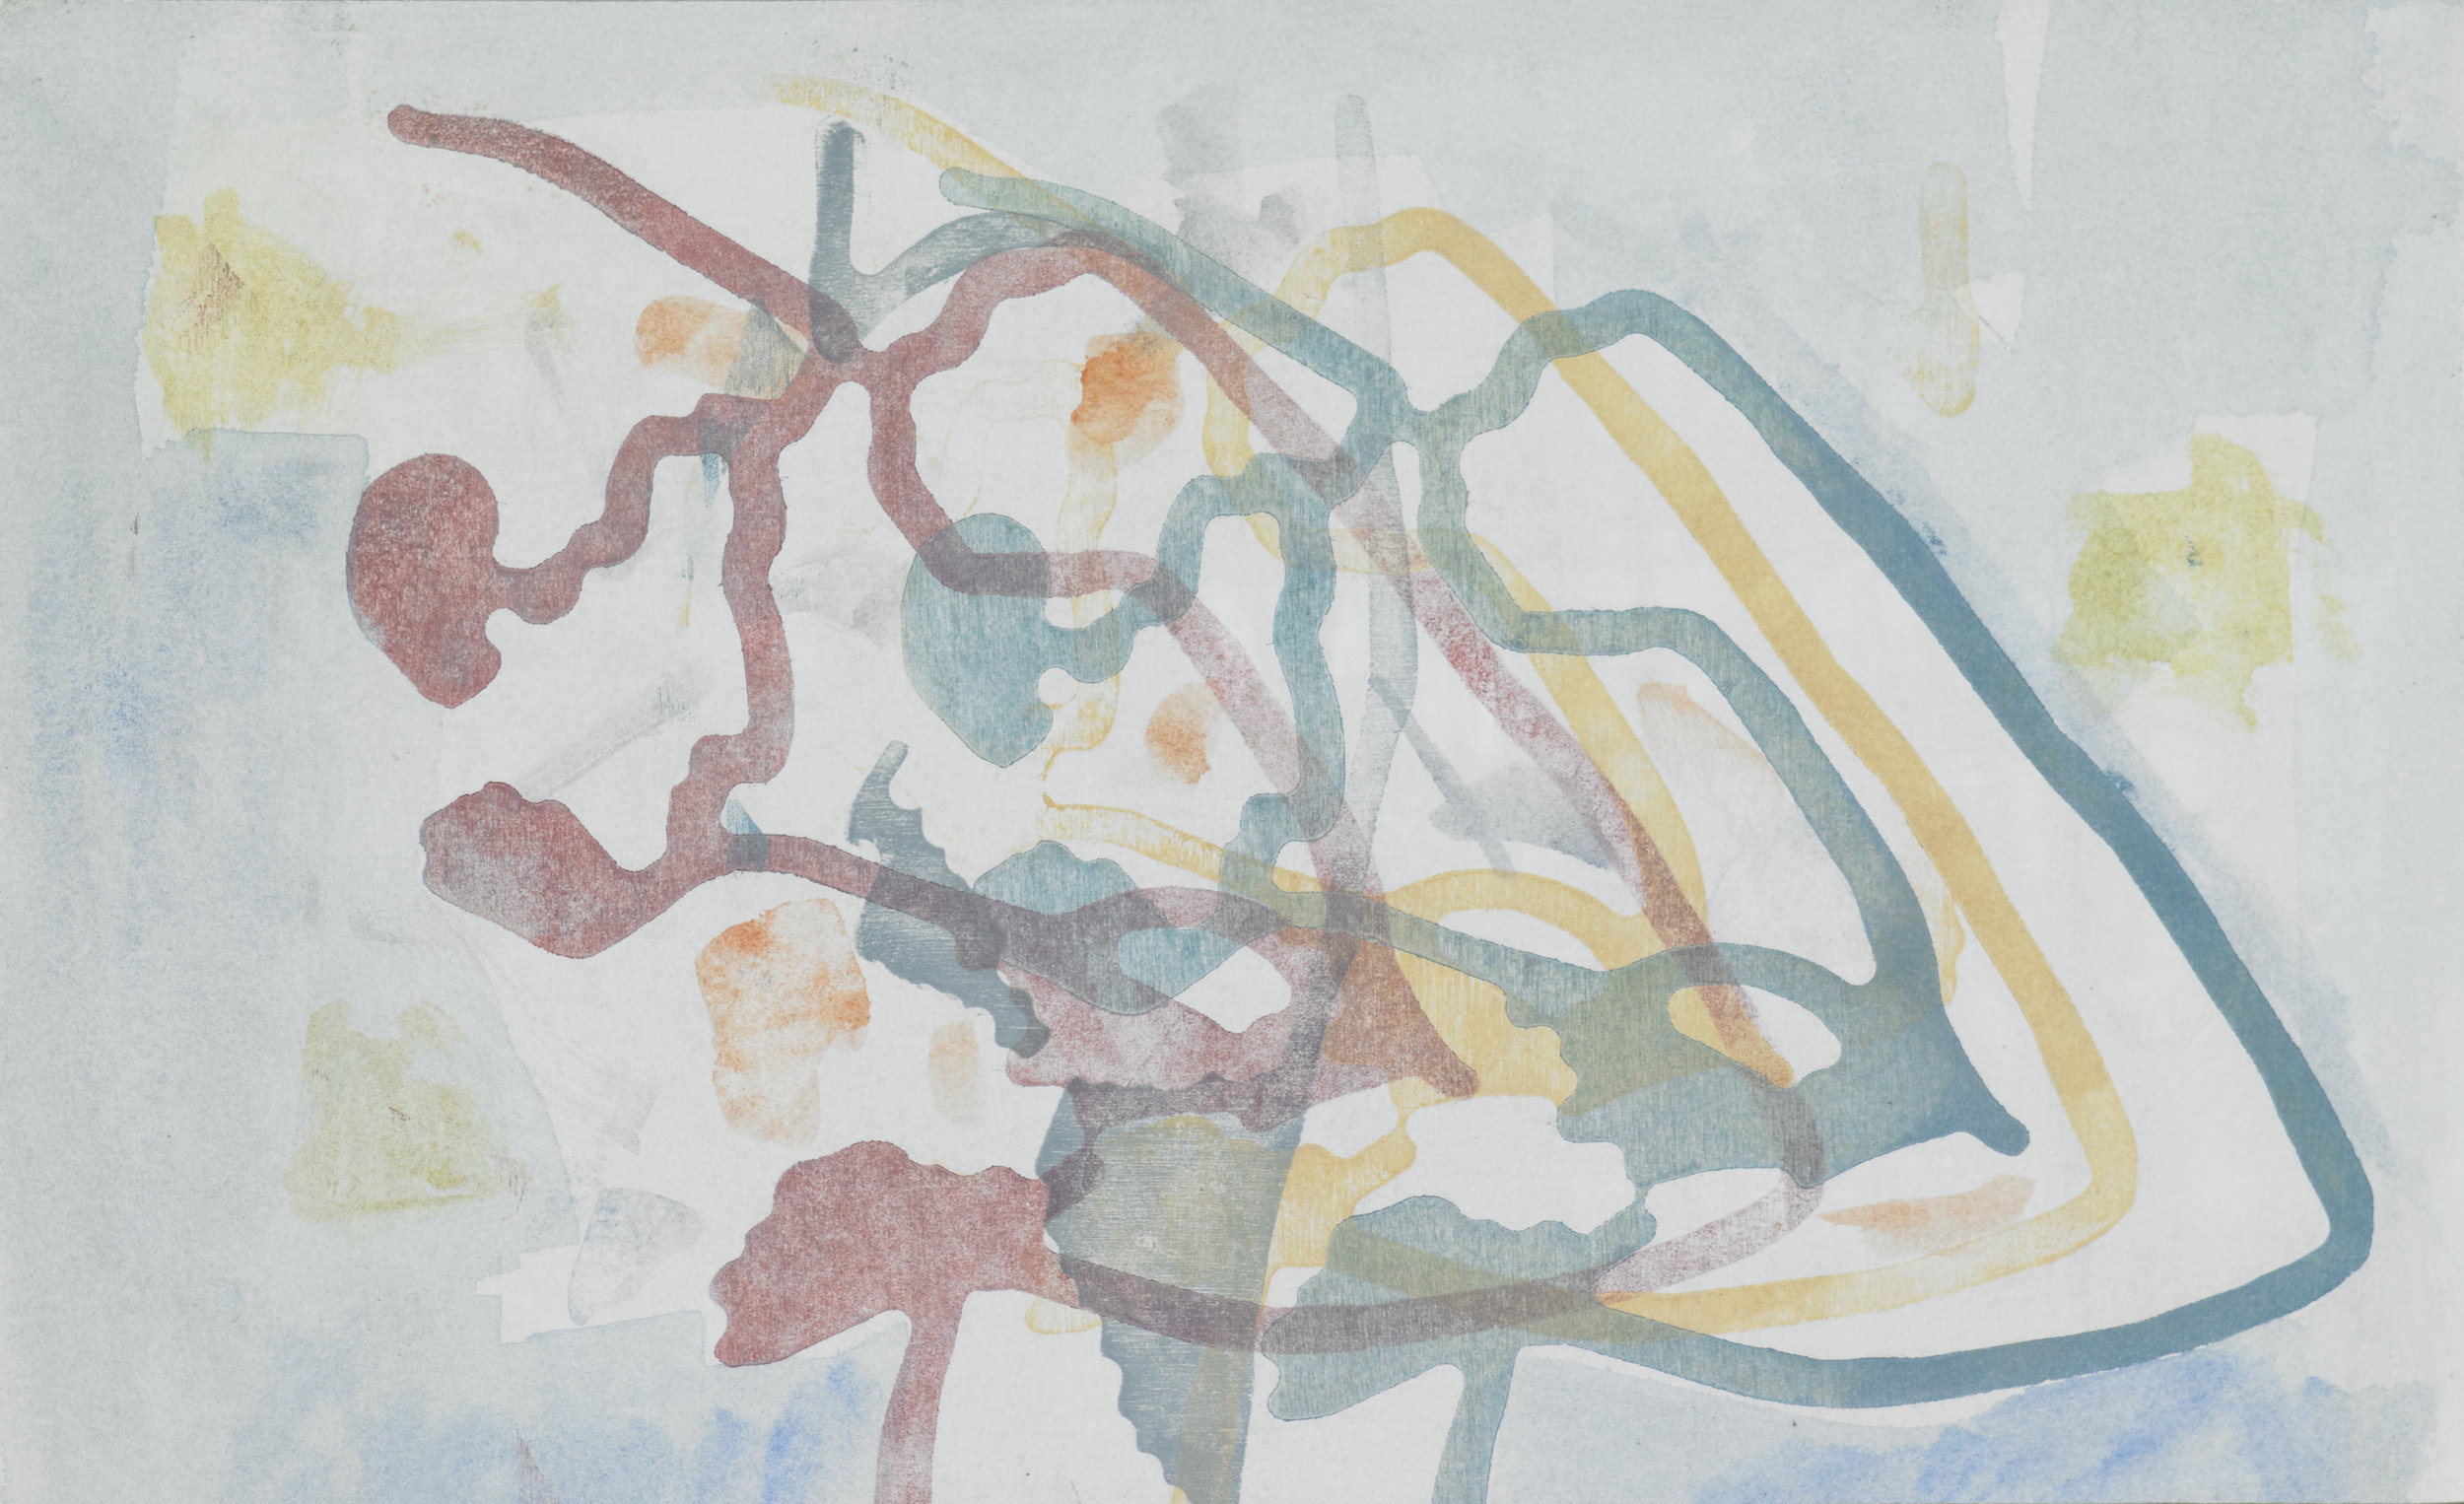 Fresco, monoprint on paper on panel, 2016